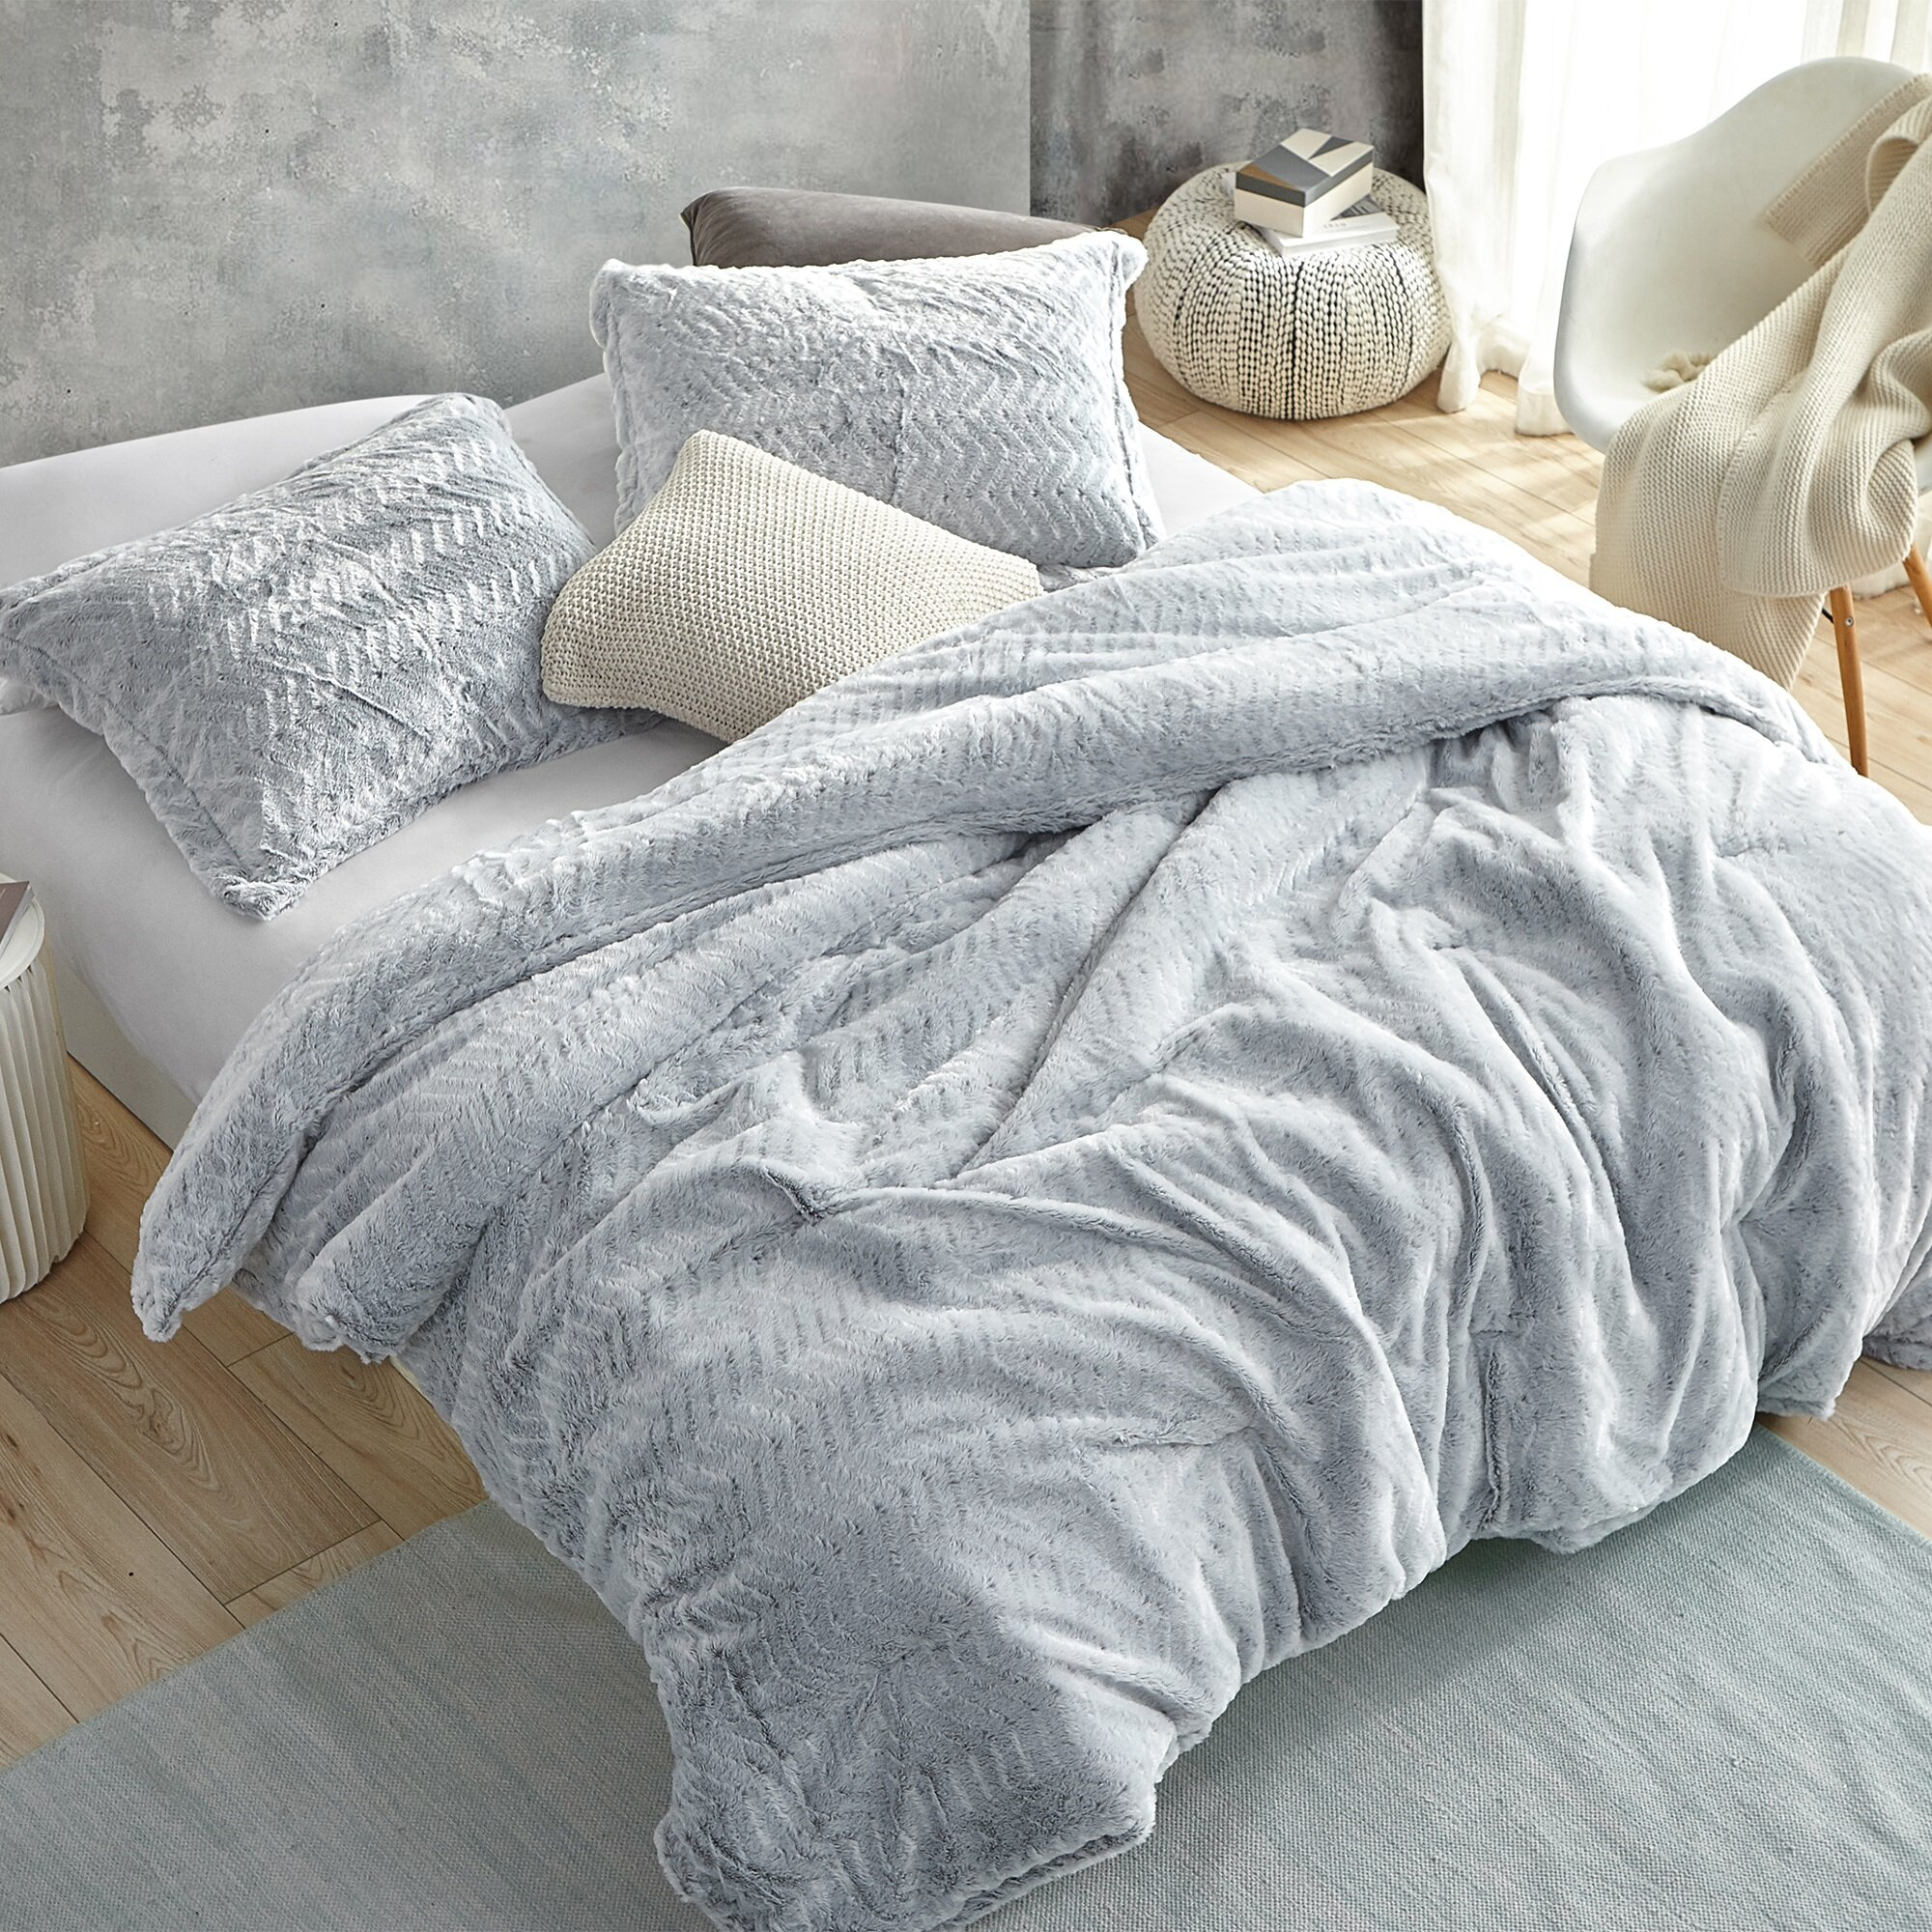 Everly Quinn Ronald Peak Of Cozy Coma Inducer Comforter Set Reviews Wayfair